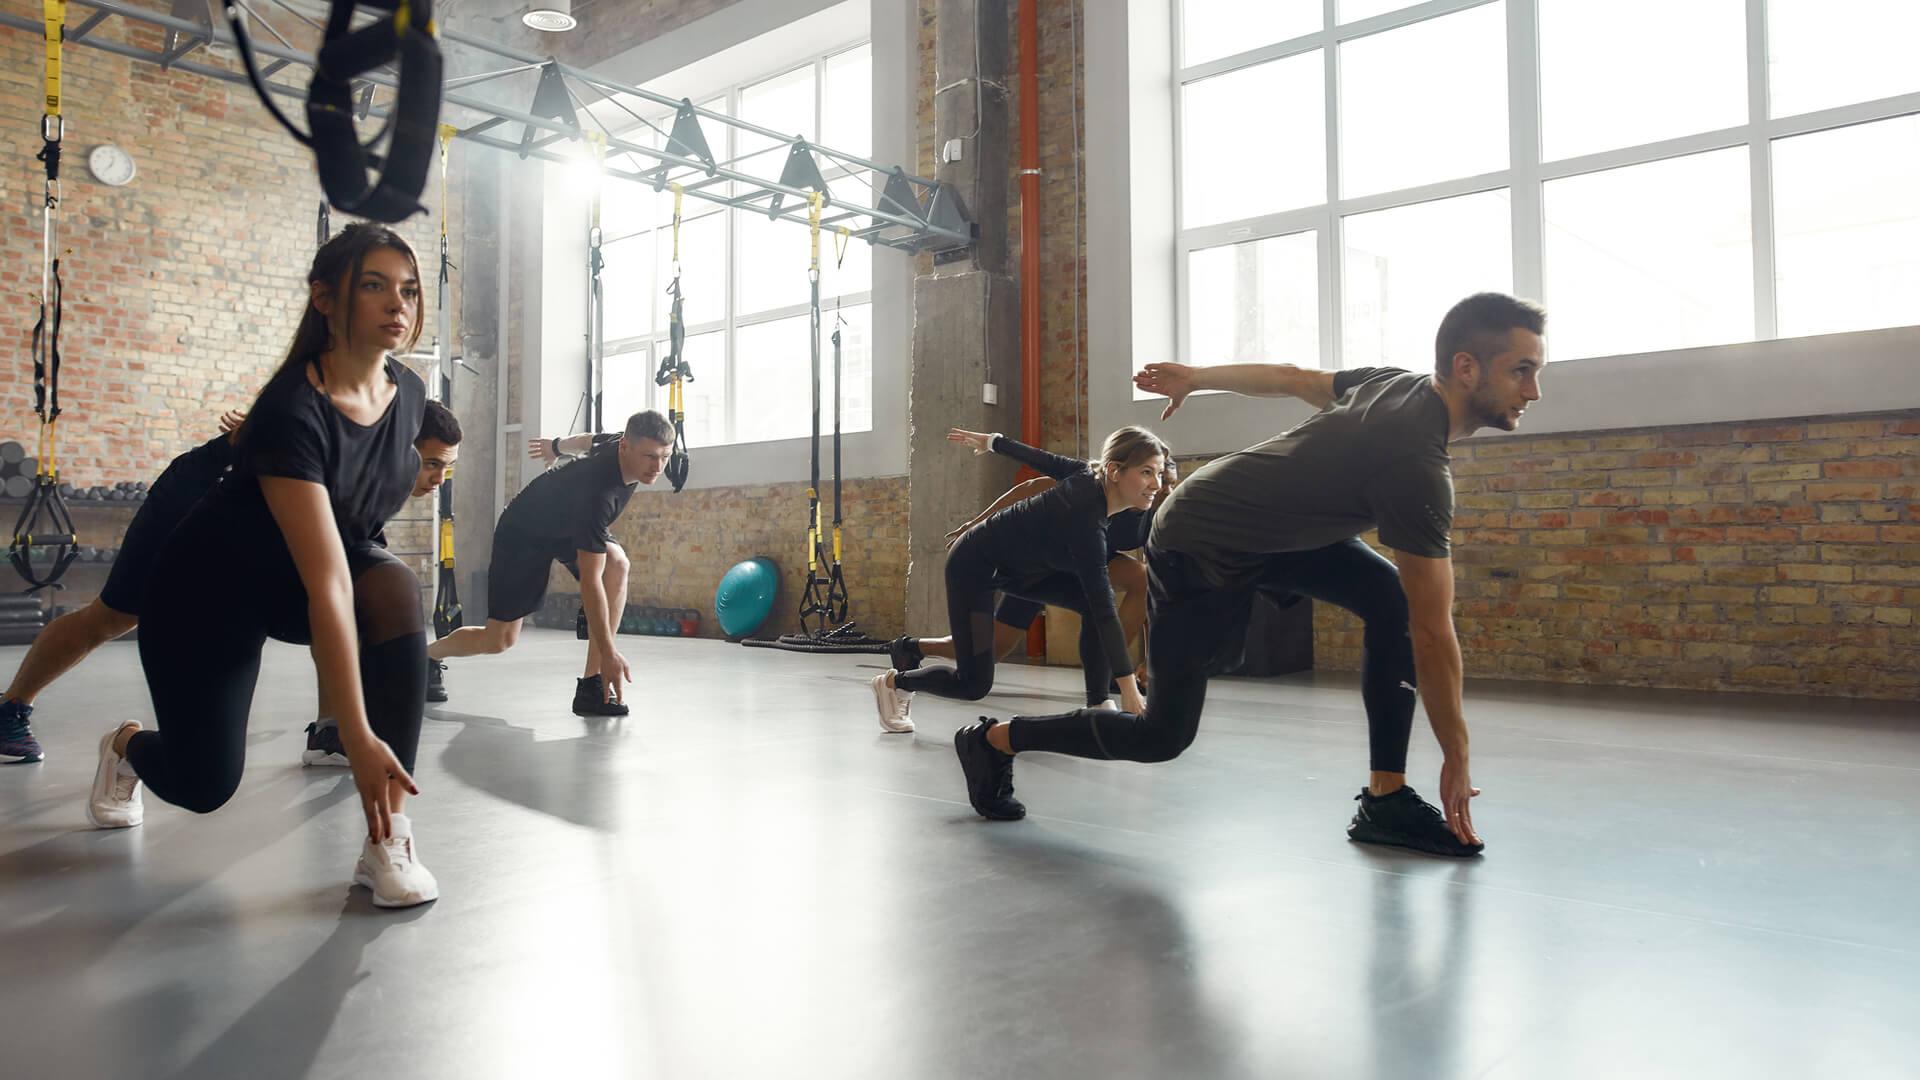 effective training on fitness equipment